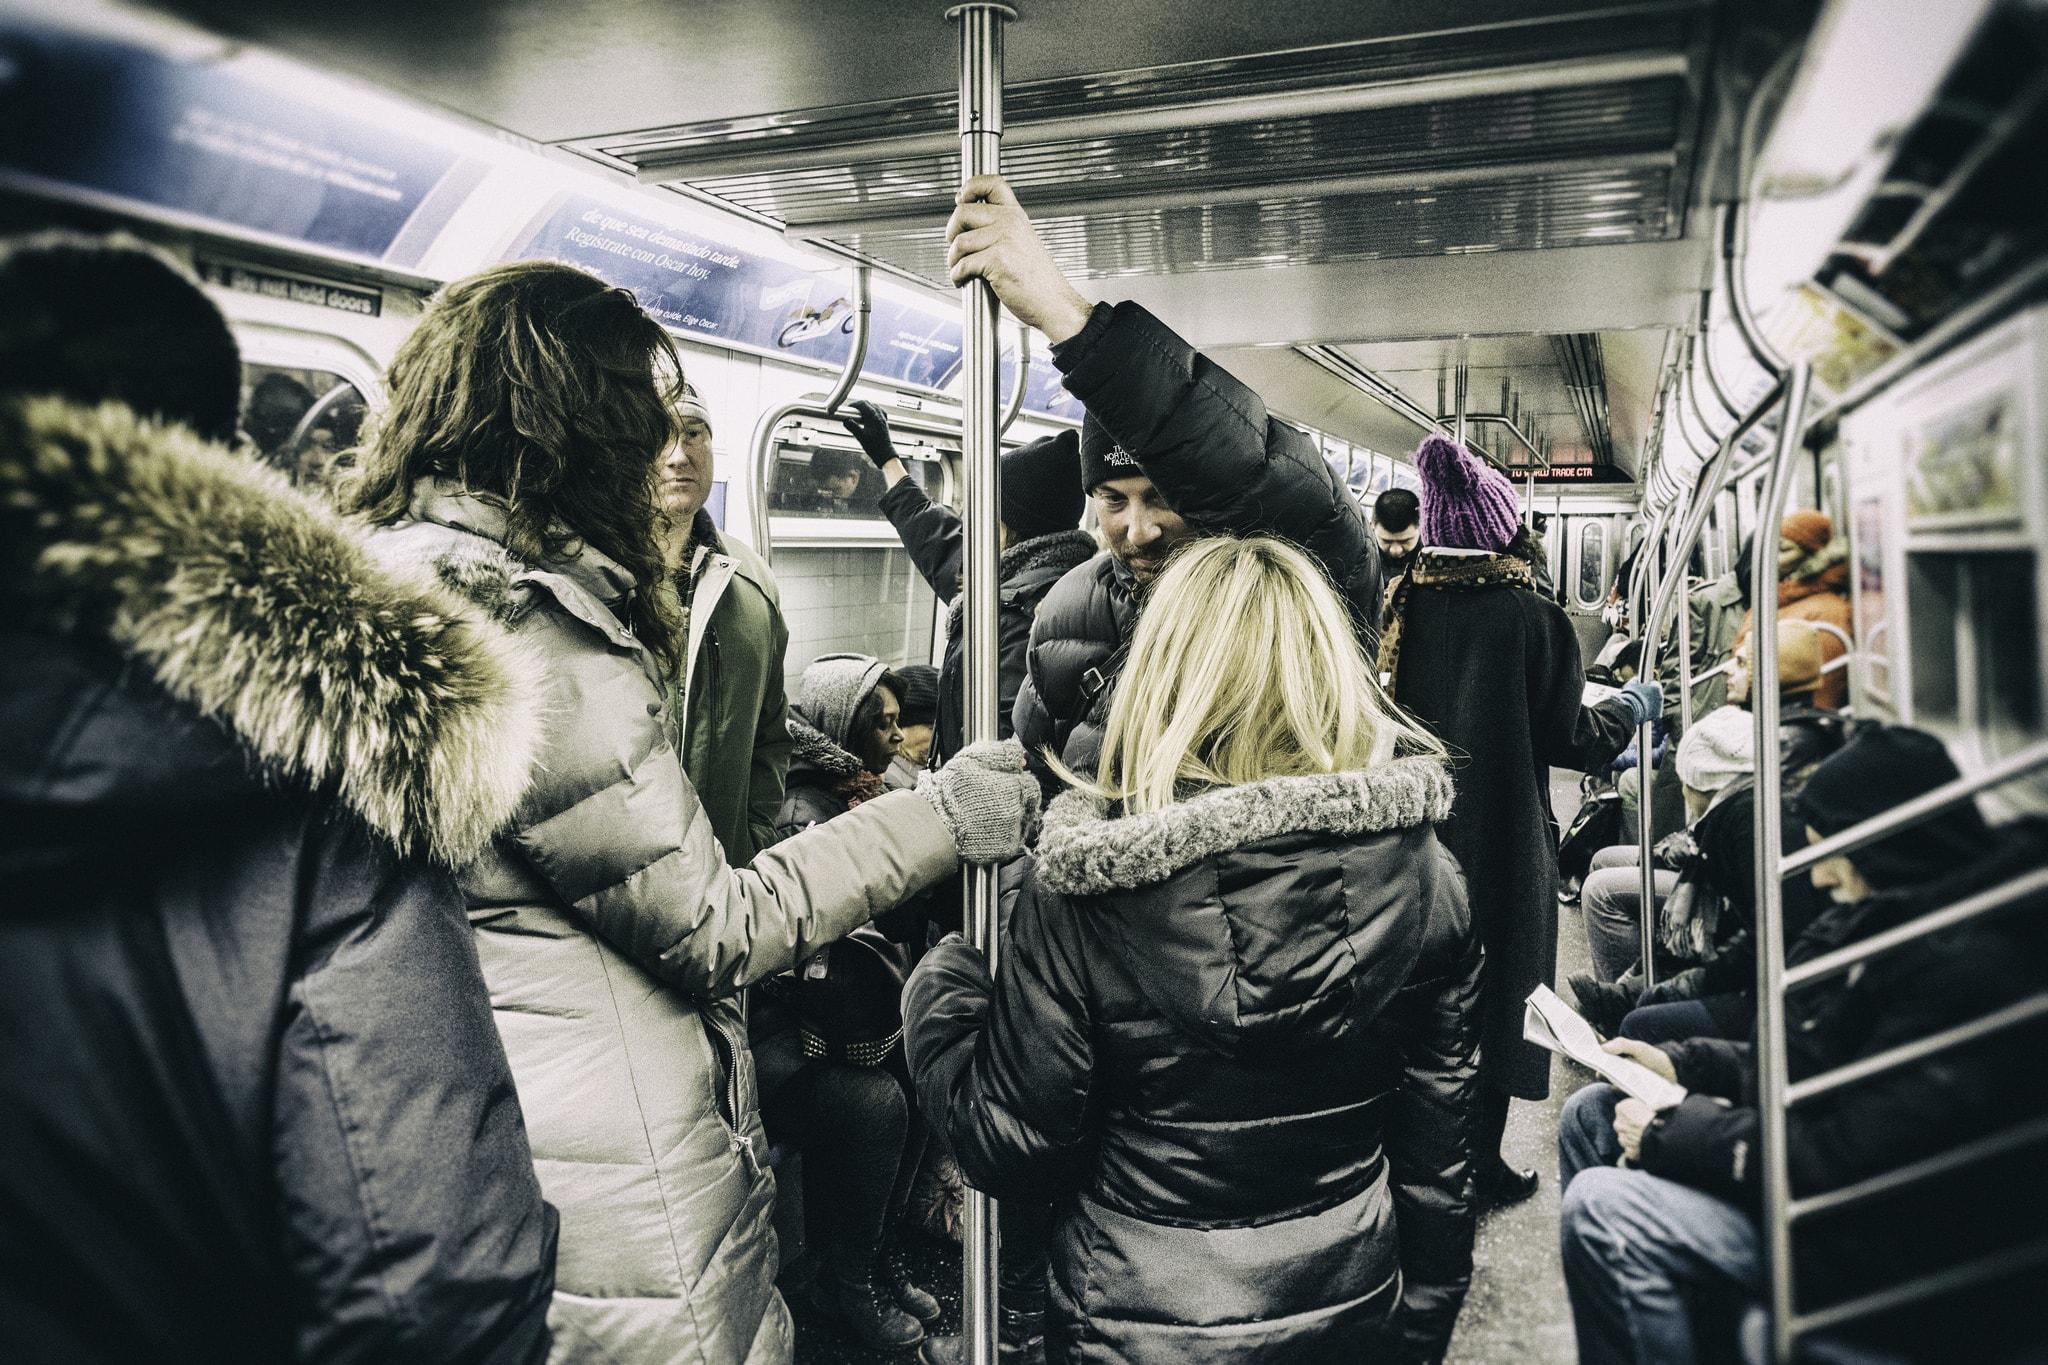 New York City subway | James Loesch Flickr